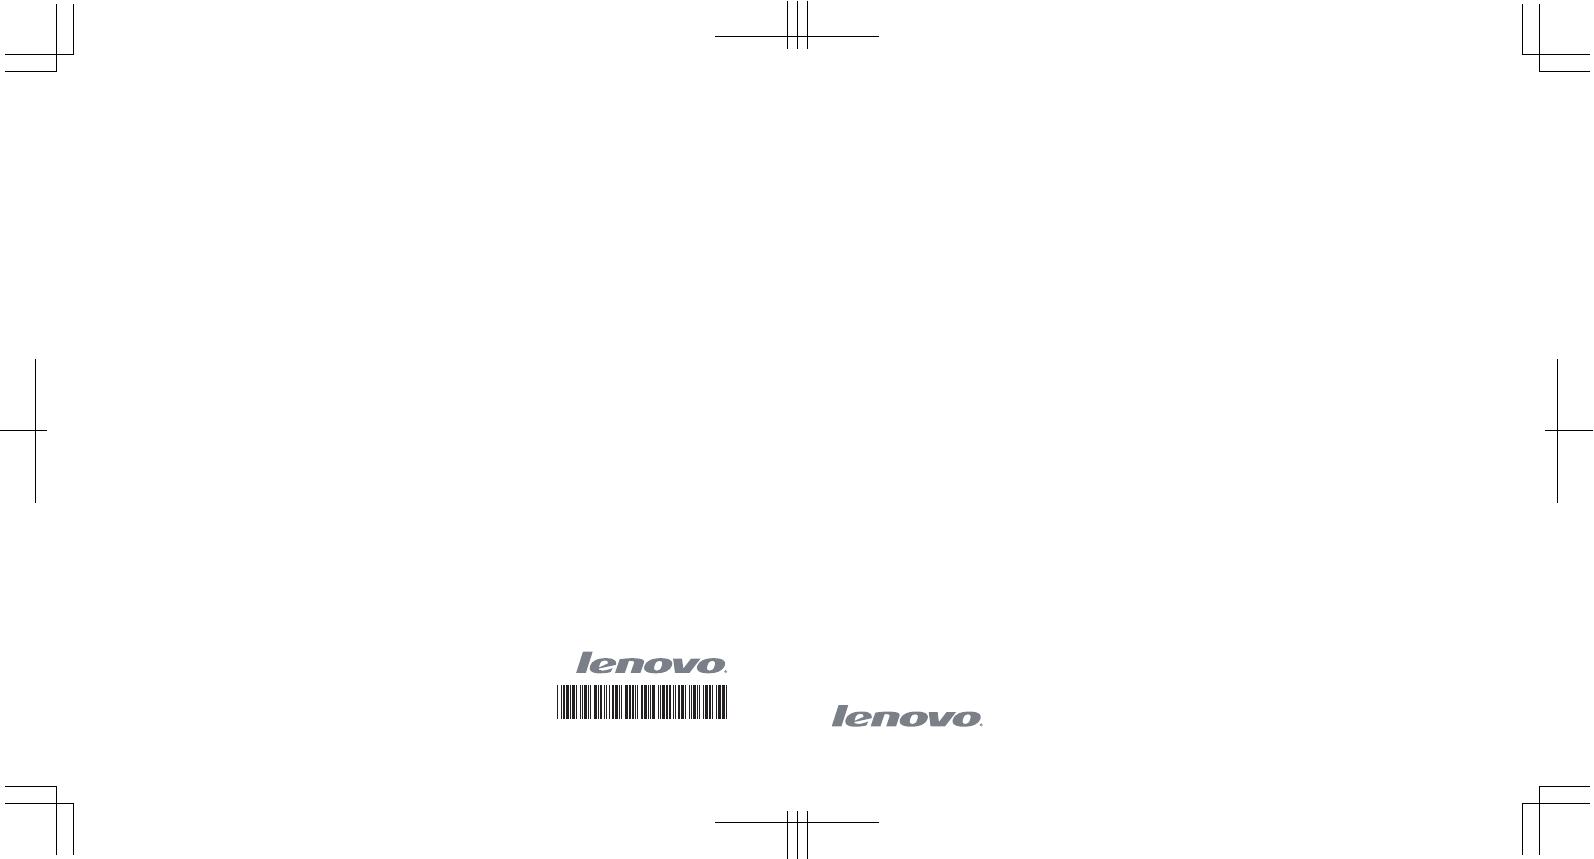 Intel Mobile Communications Len512anmu Wi Fi Link 5100 Series Saab Sid Wiring Diagram User Manual U130 Regulatorynoticev1 0 Us Eu Non Ap